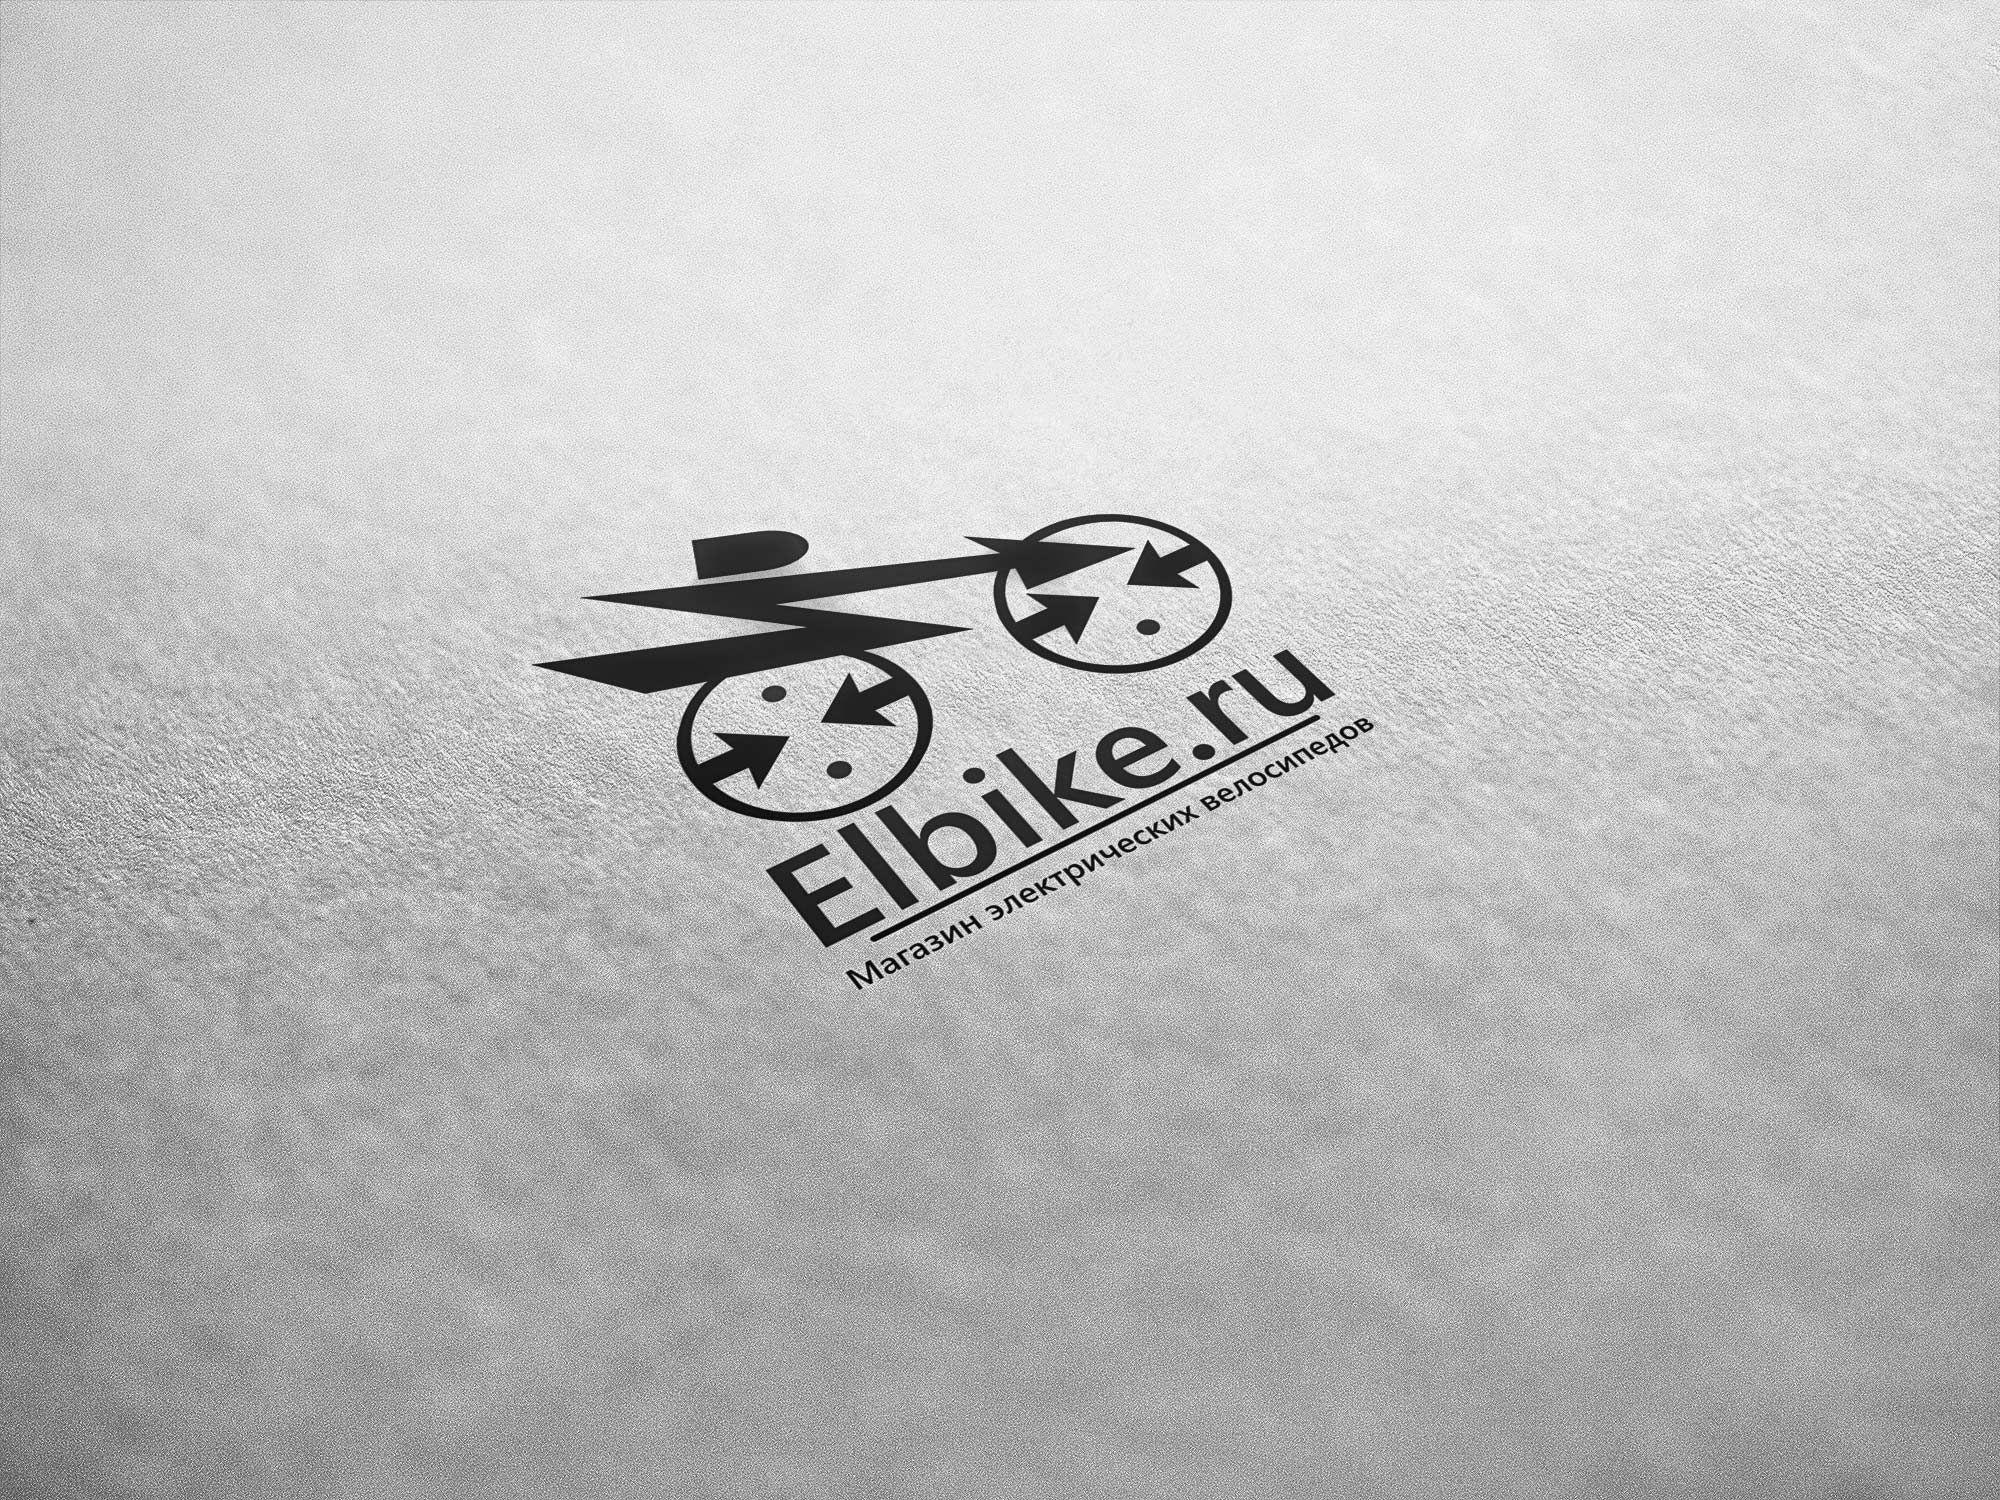 Фирменный стиль для Elbike.ru - дизайнер Anyutochkin